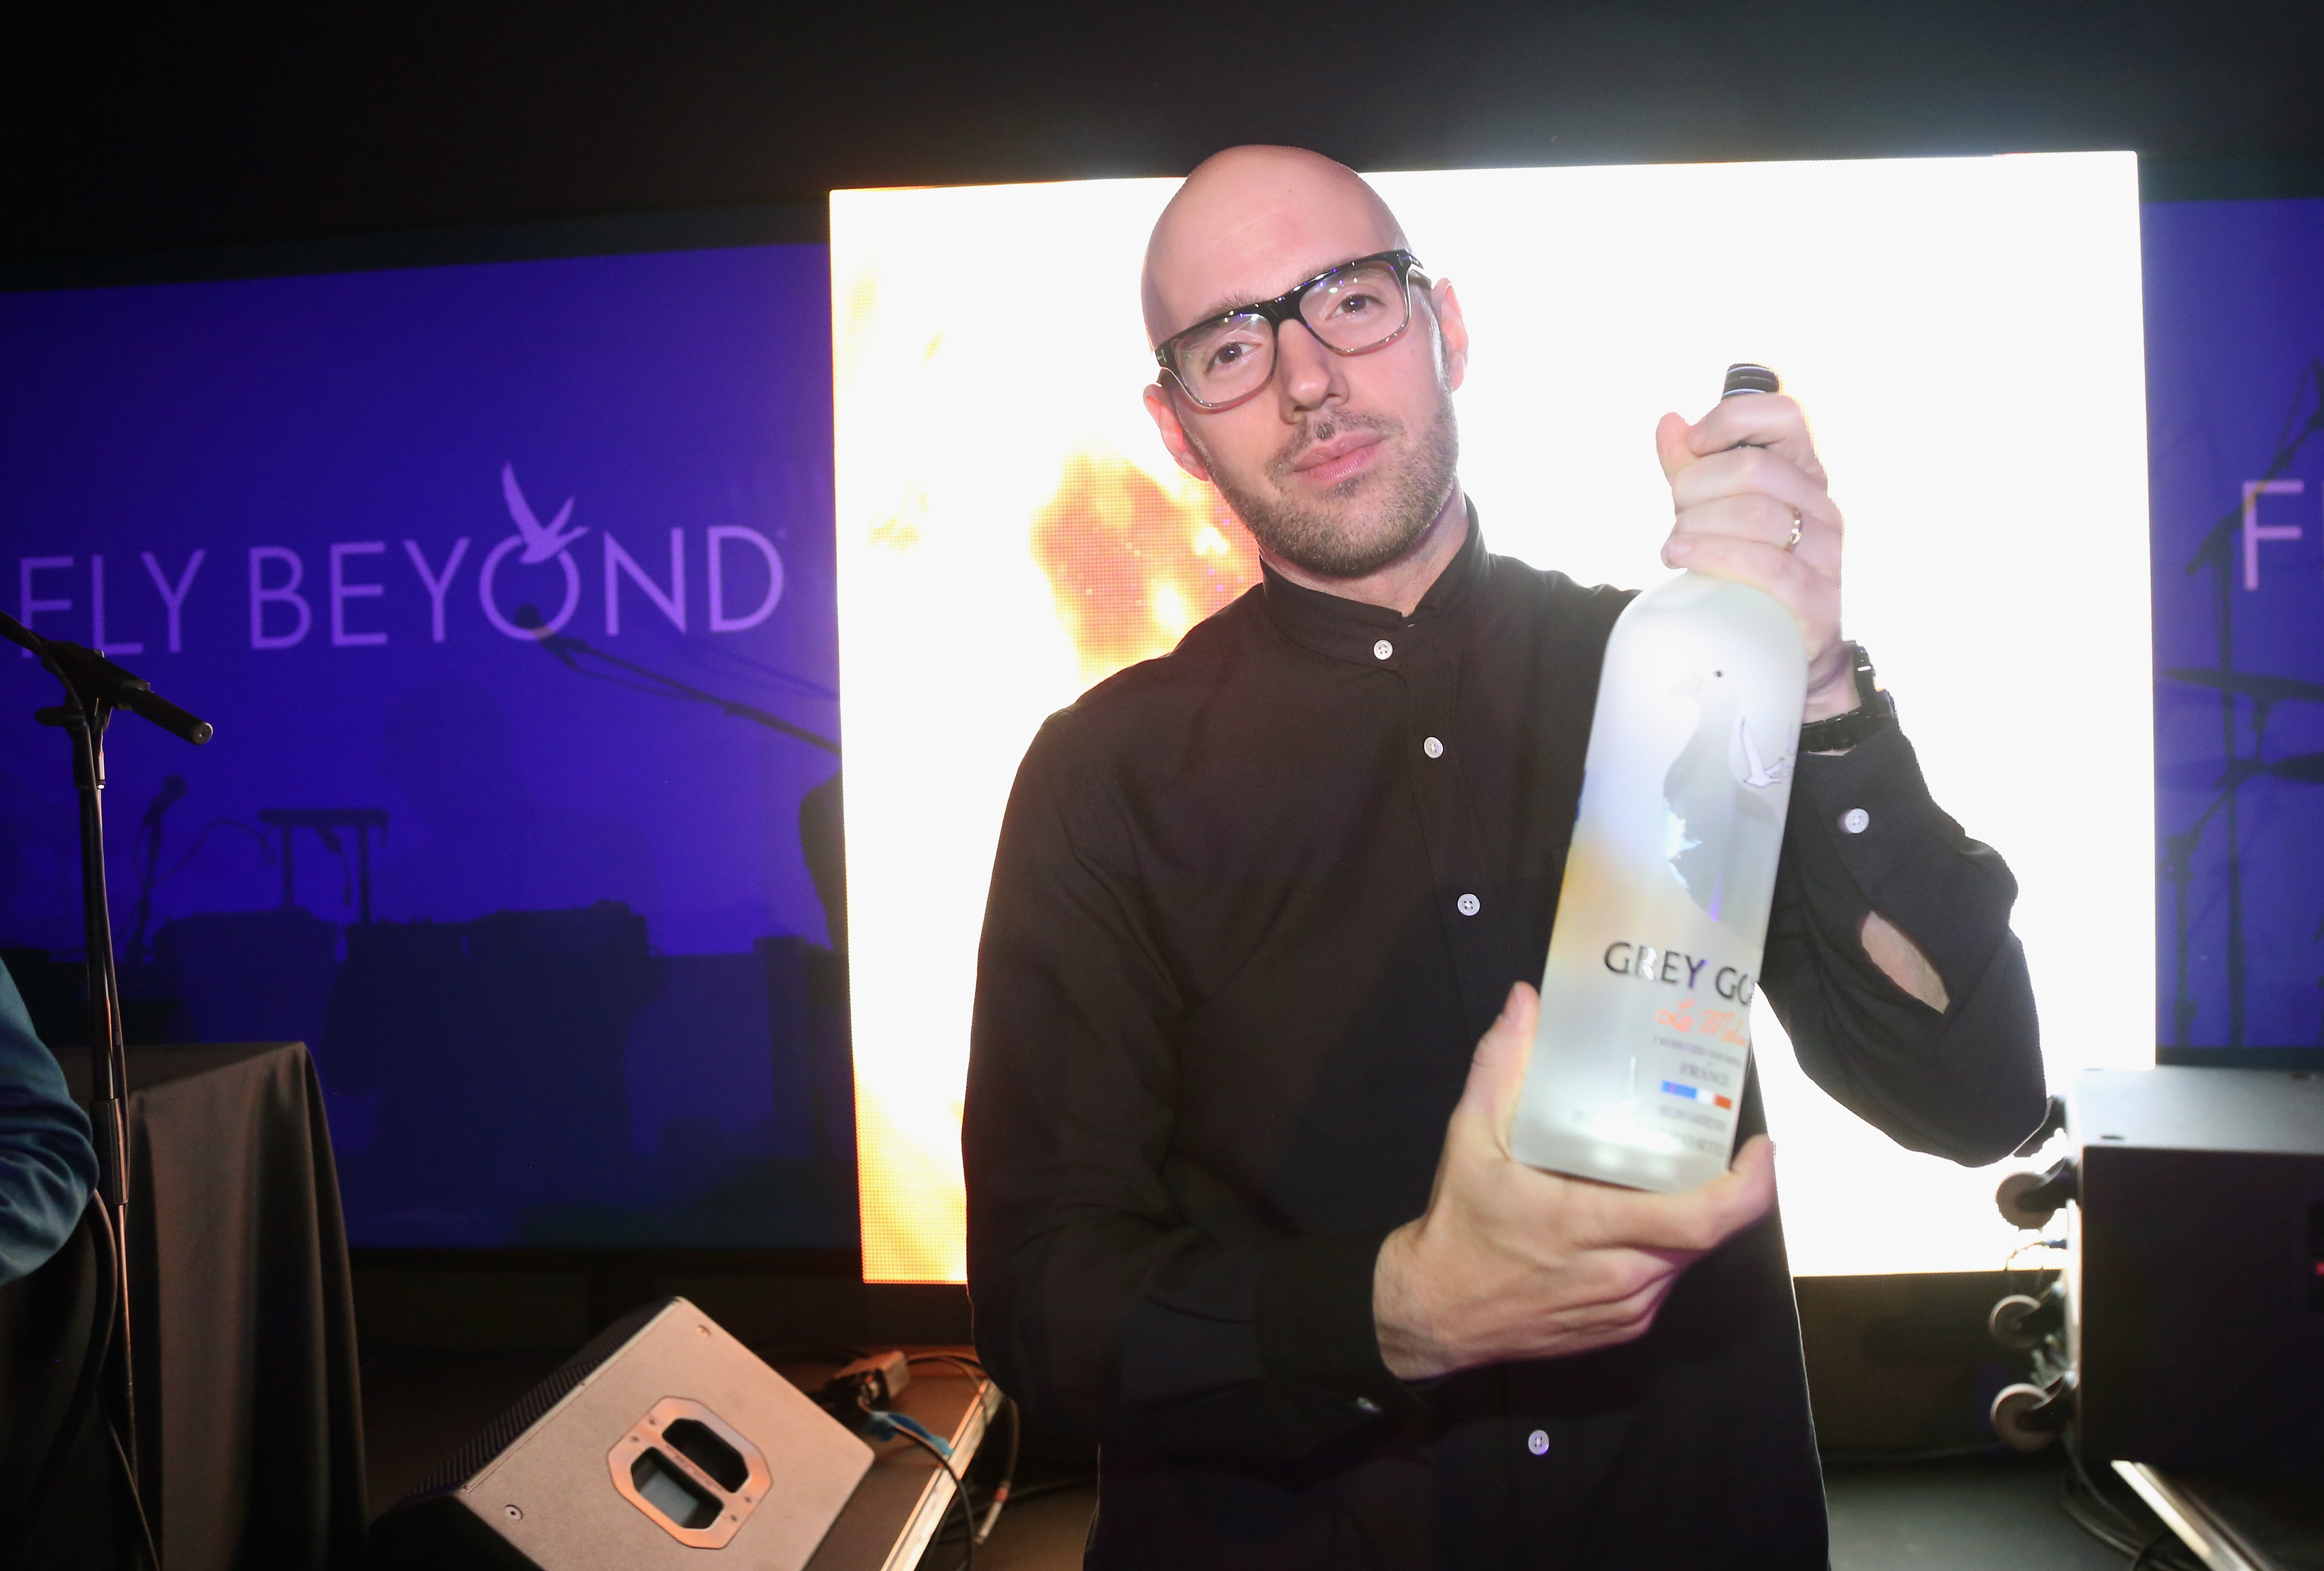 GREY GOOSE Vodka Hosts The Official Launch Of GREY GOOSE Le Melon